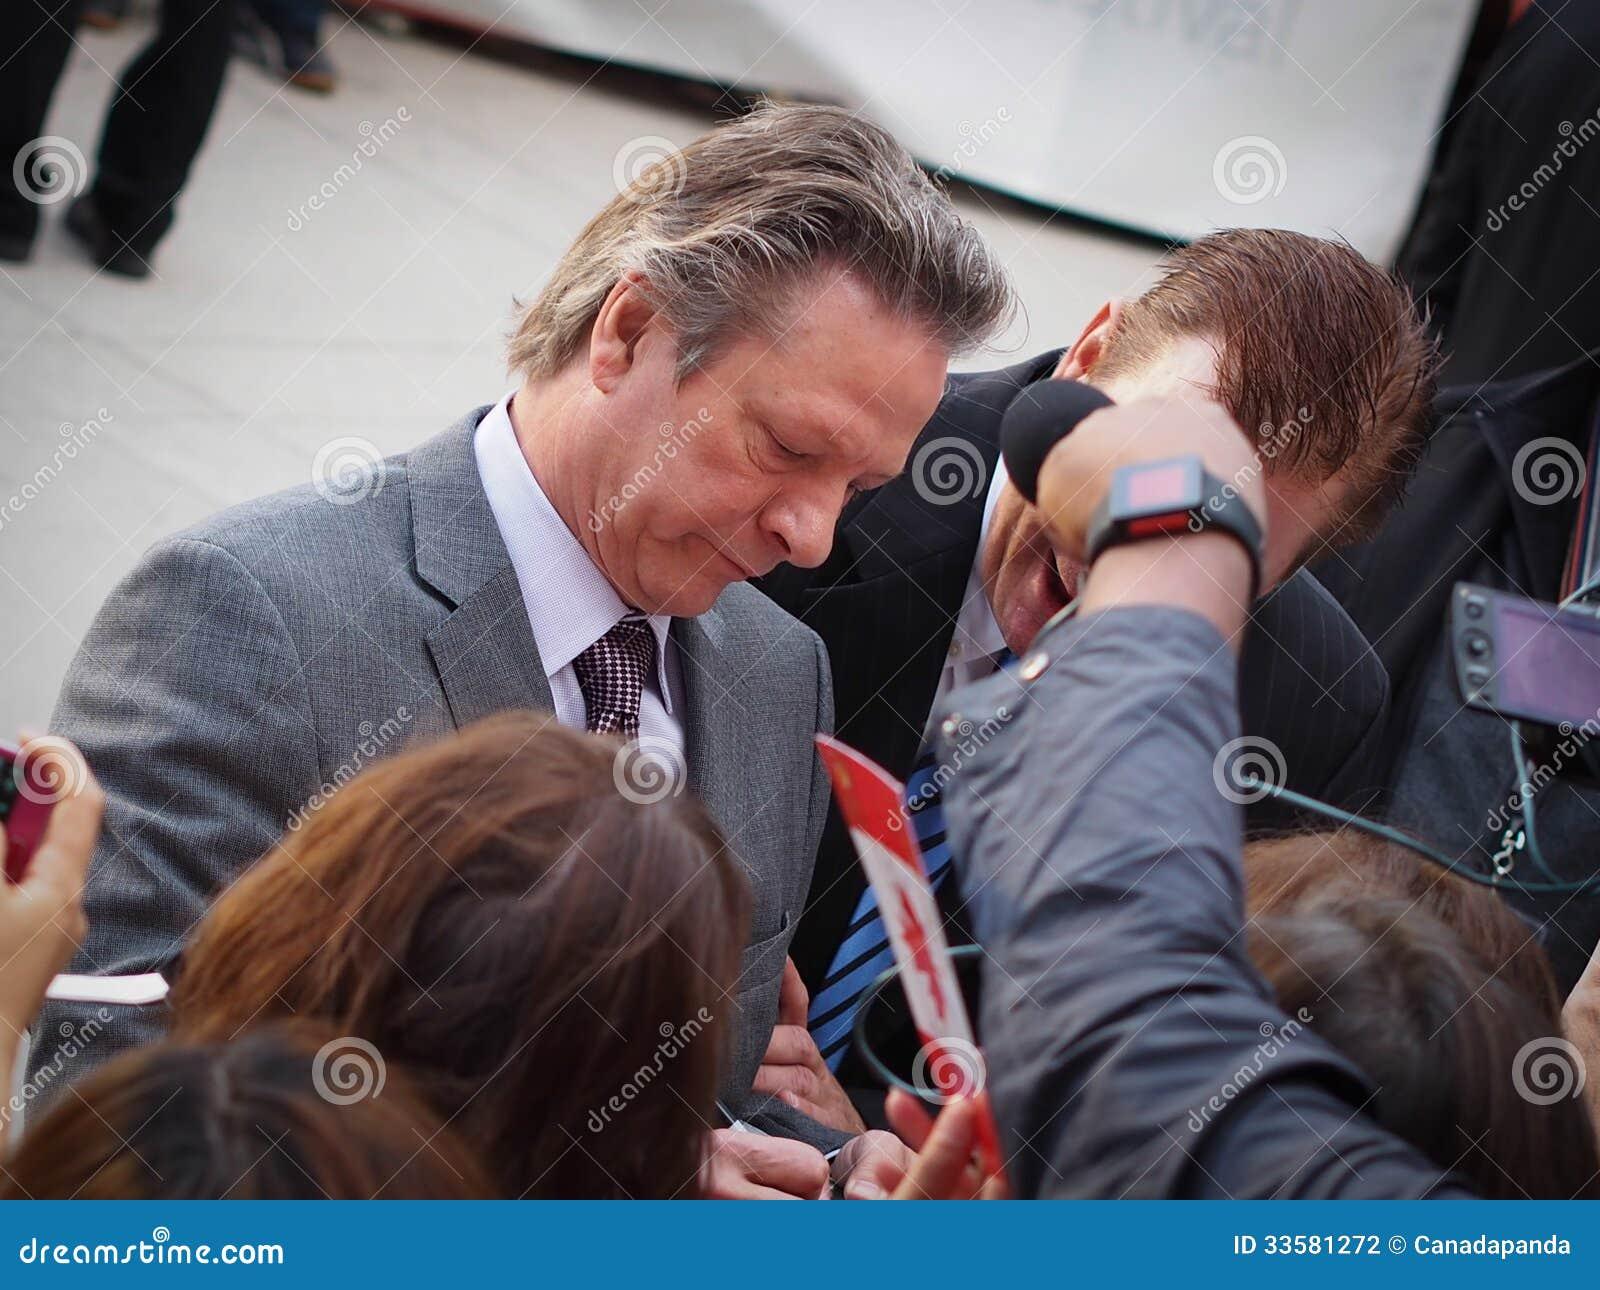 Celebrity autograph for sale